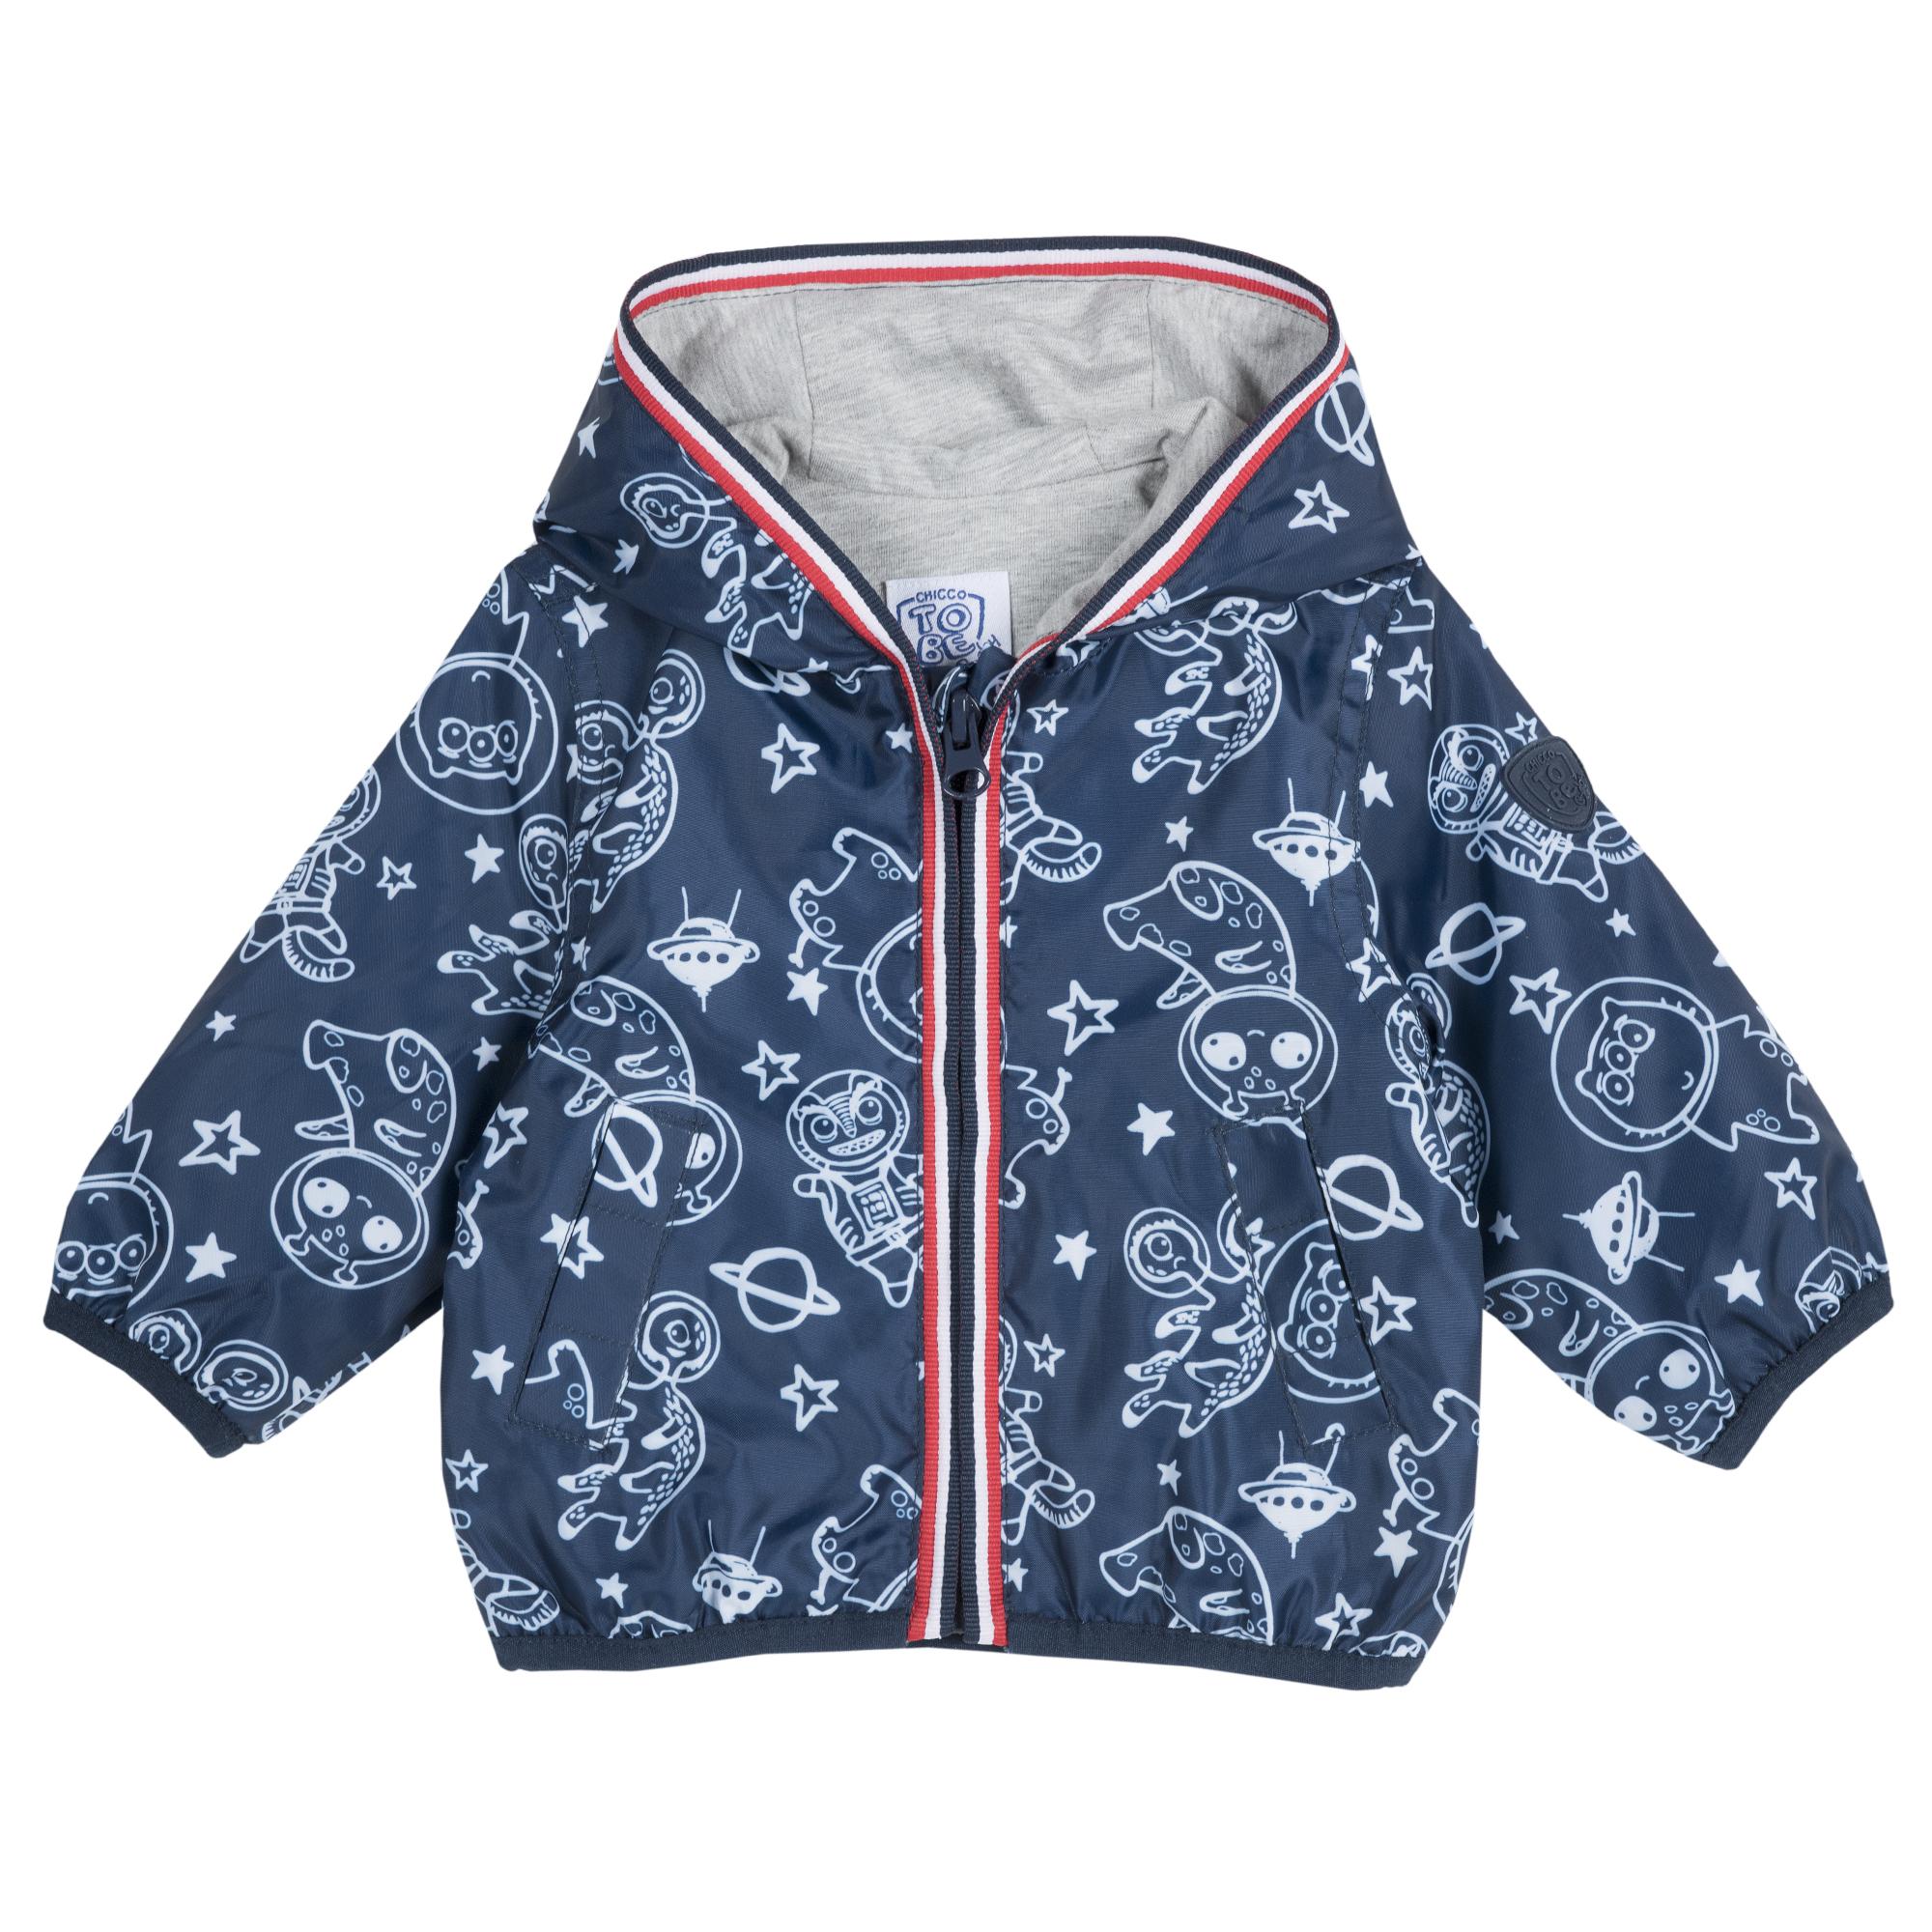 Jacheta copii Chicco, albastru inchis, 87379